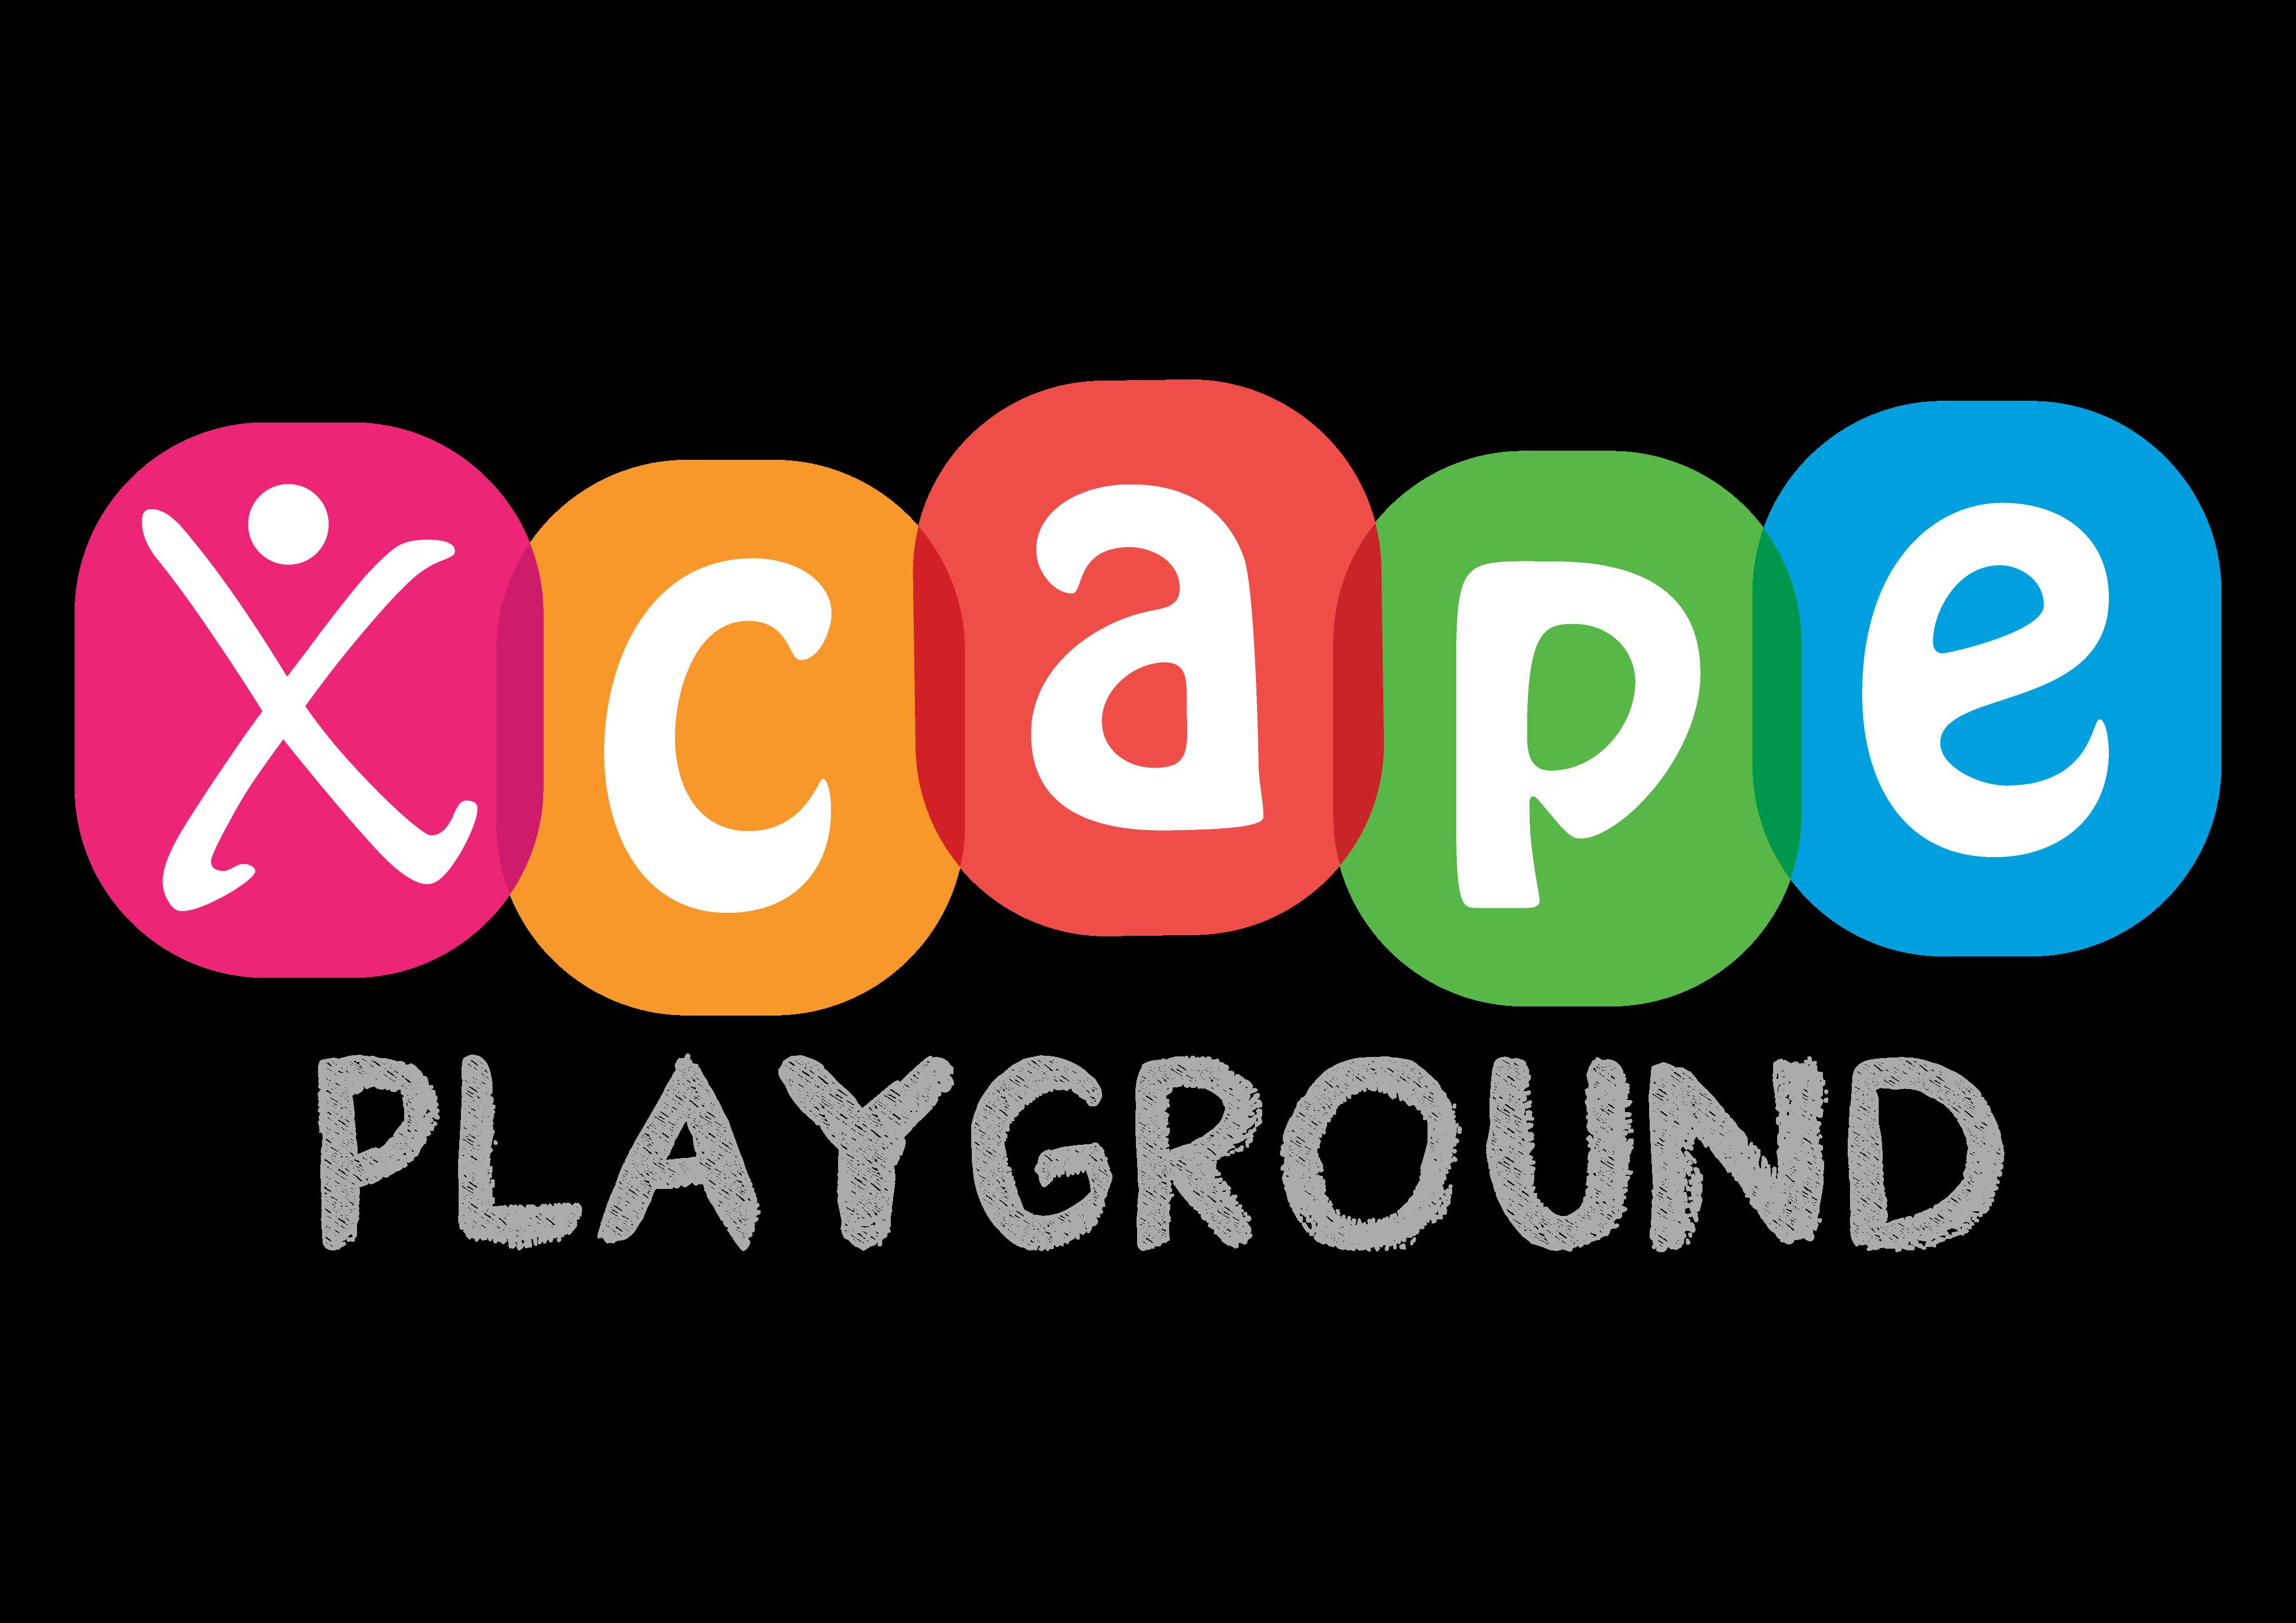 Xcape Playground-Loc de joaca/Kids escape room